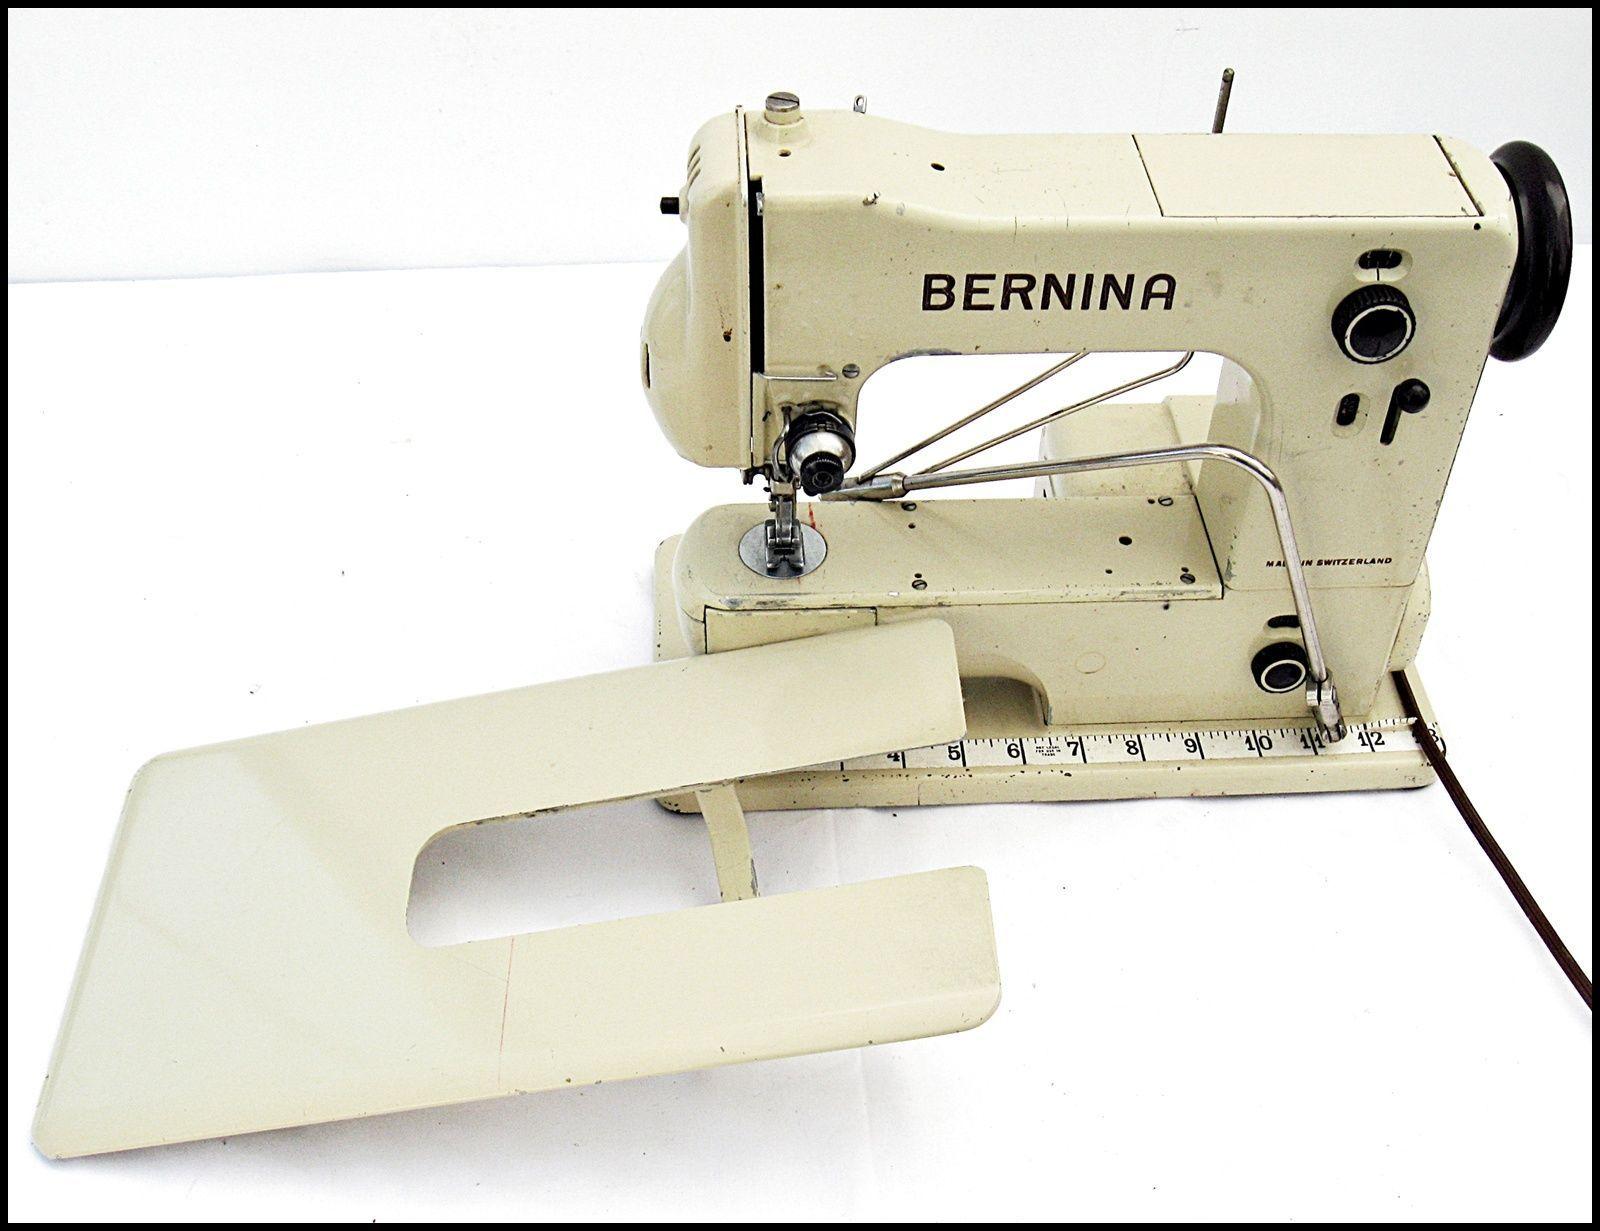 Bernina 125 1940s Sewing Machine Bernina Tips And Tricks